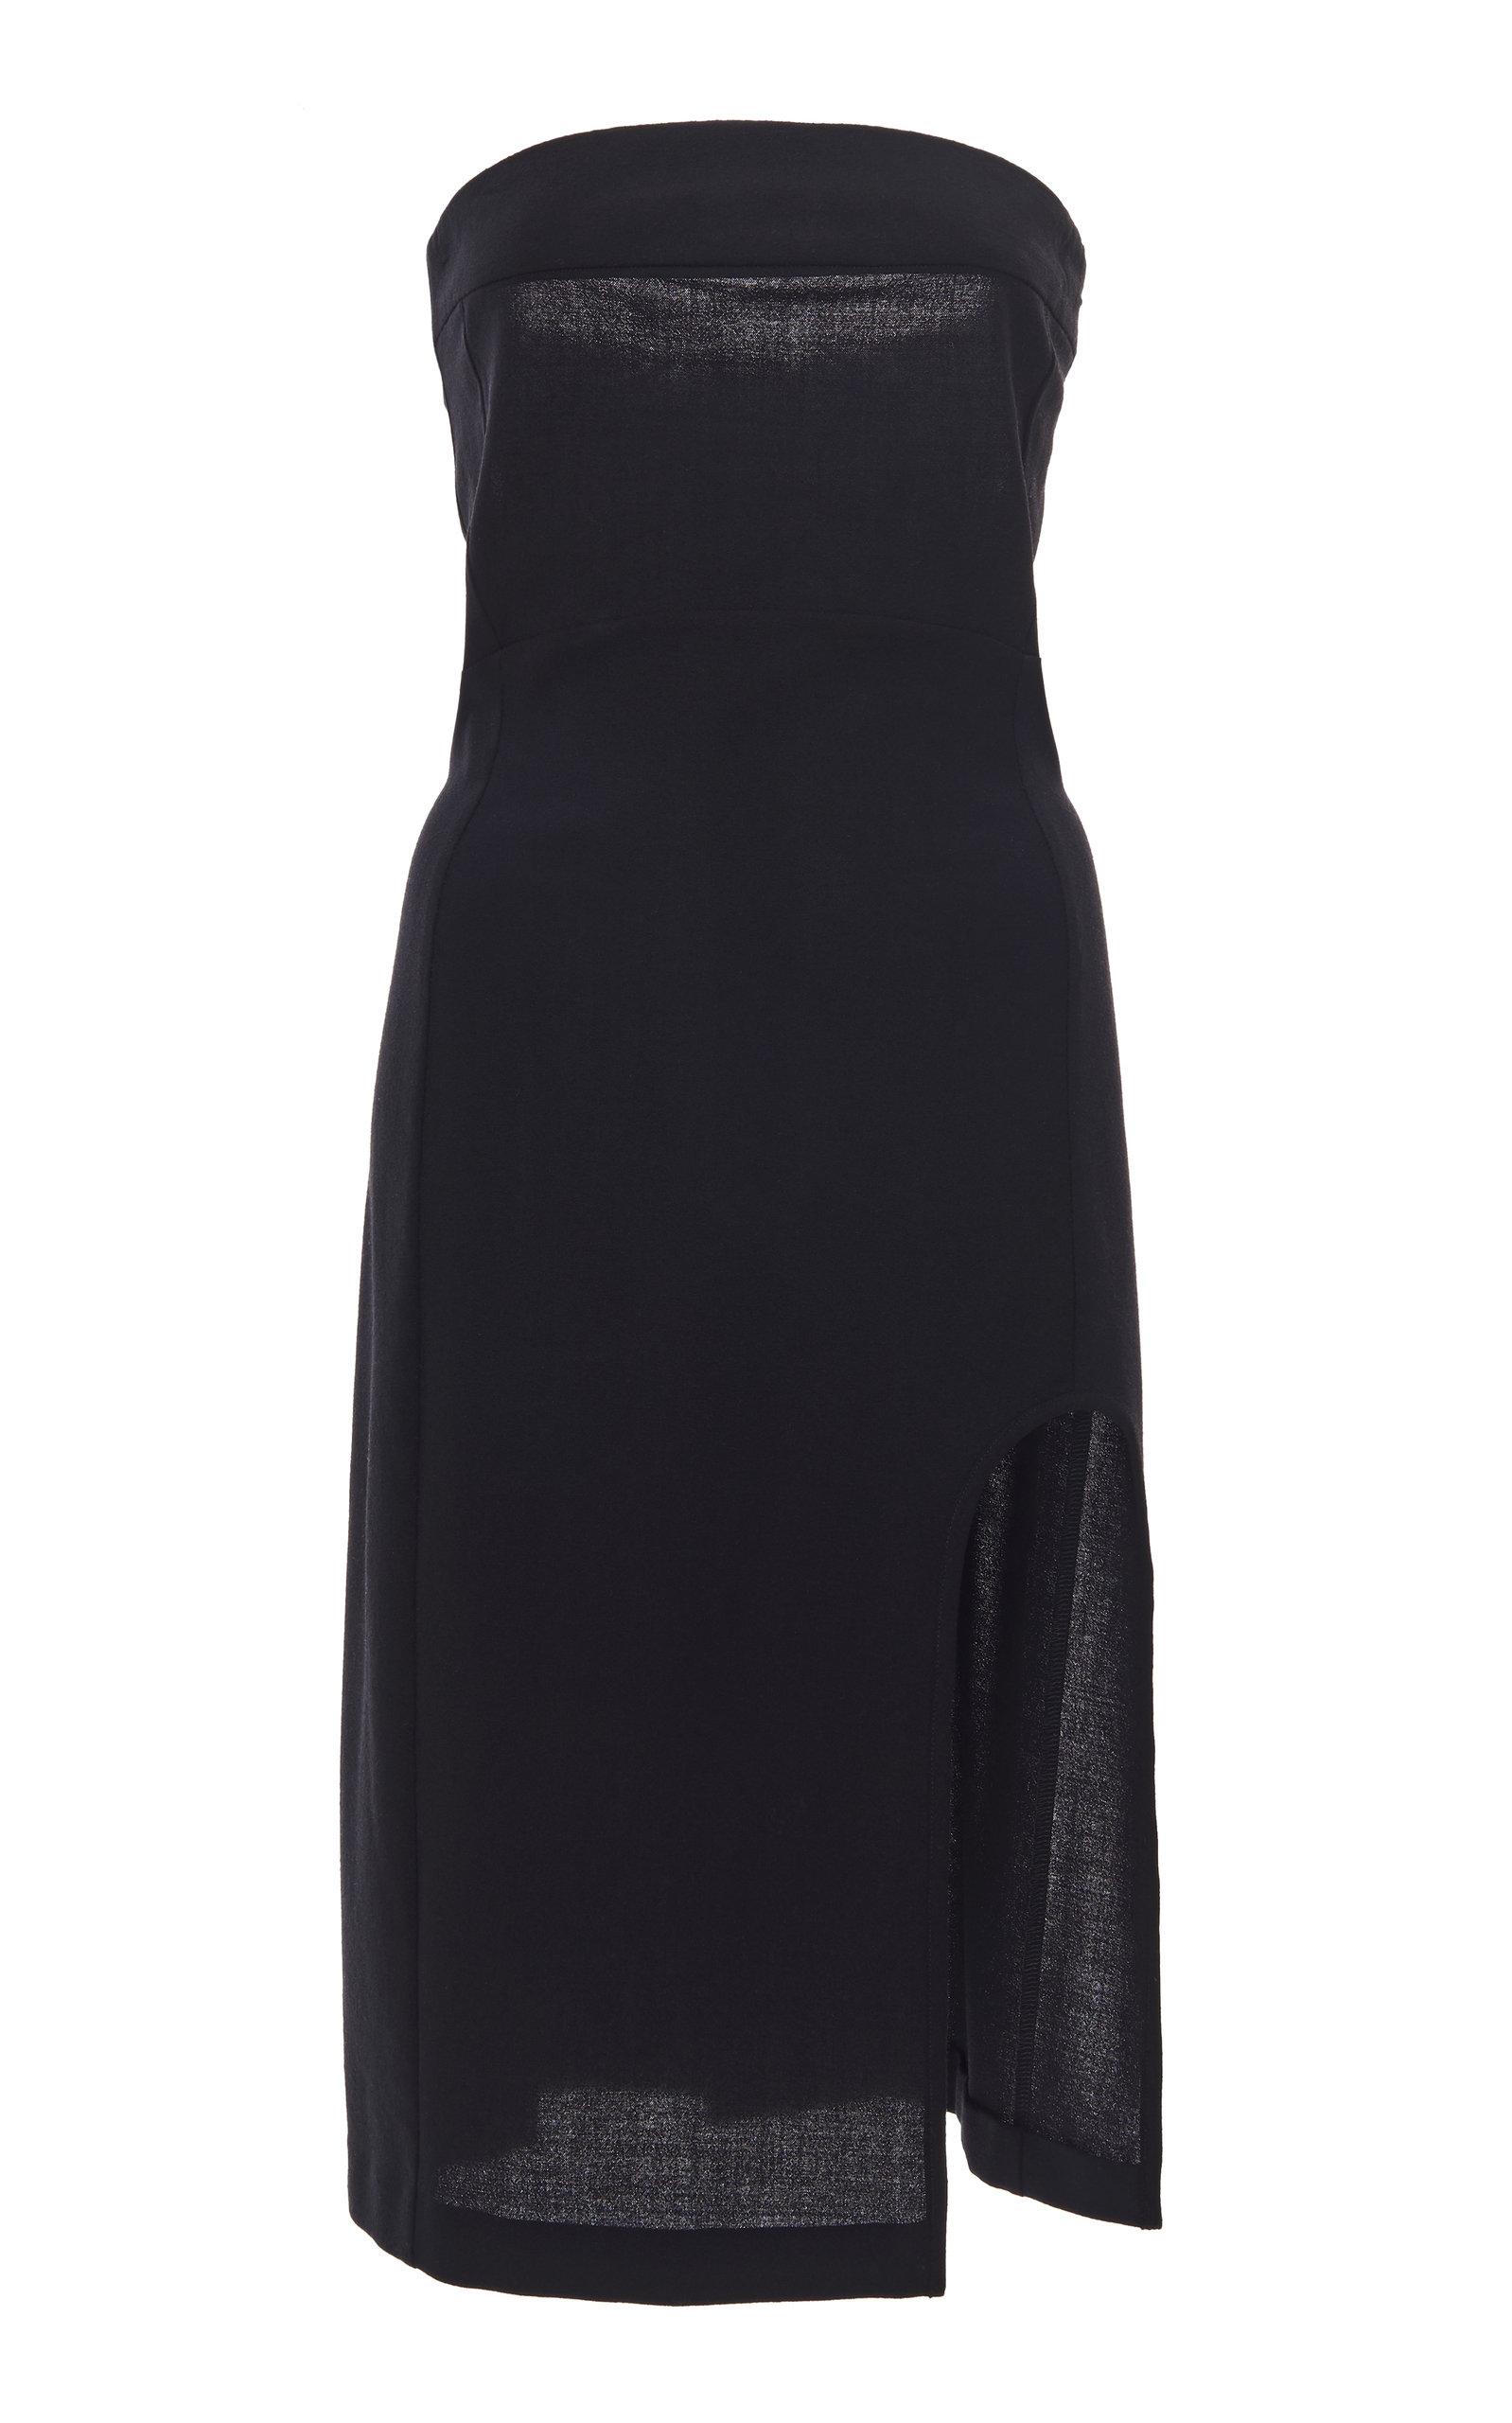 Buy Ann Demeulemeester Cutout Knit Strapless Midi Dress online, shop Ann Demeulemeester at the best price